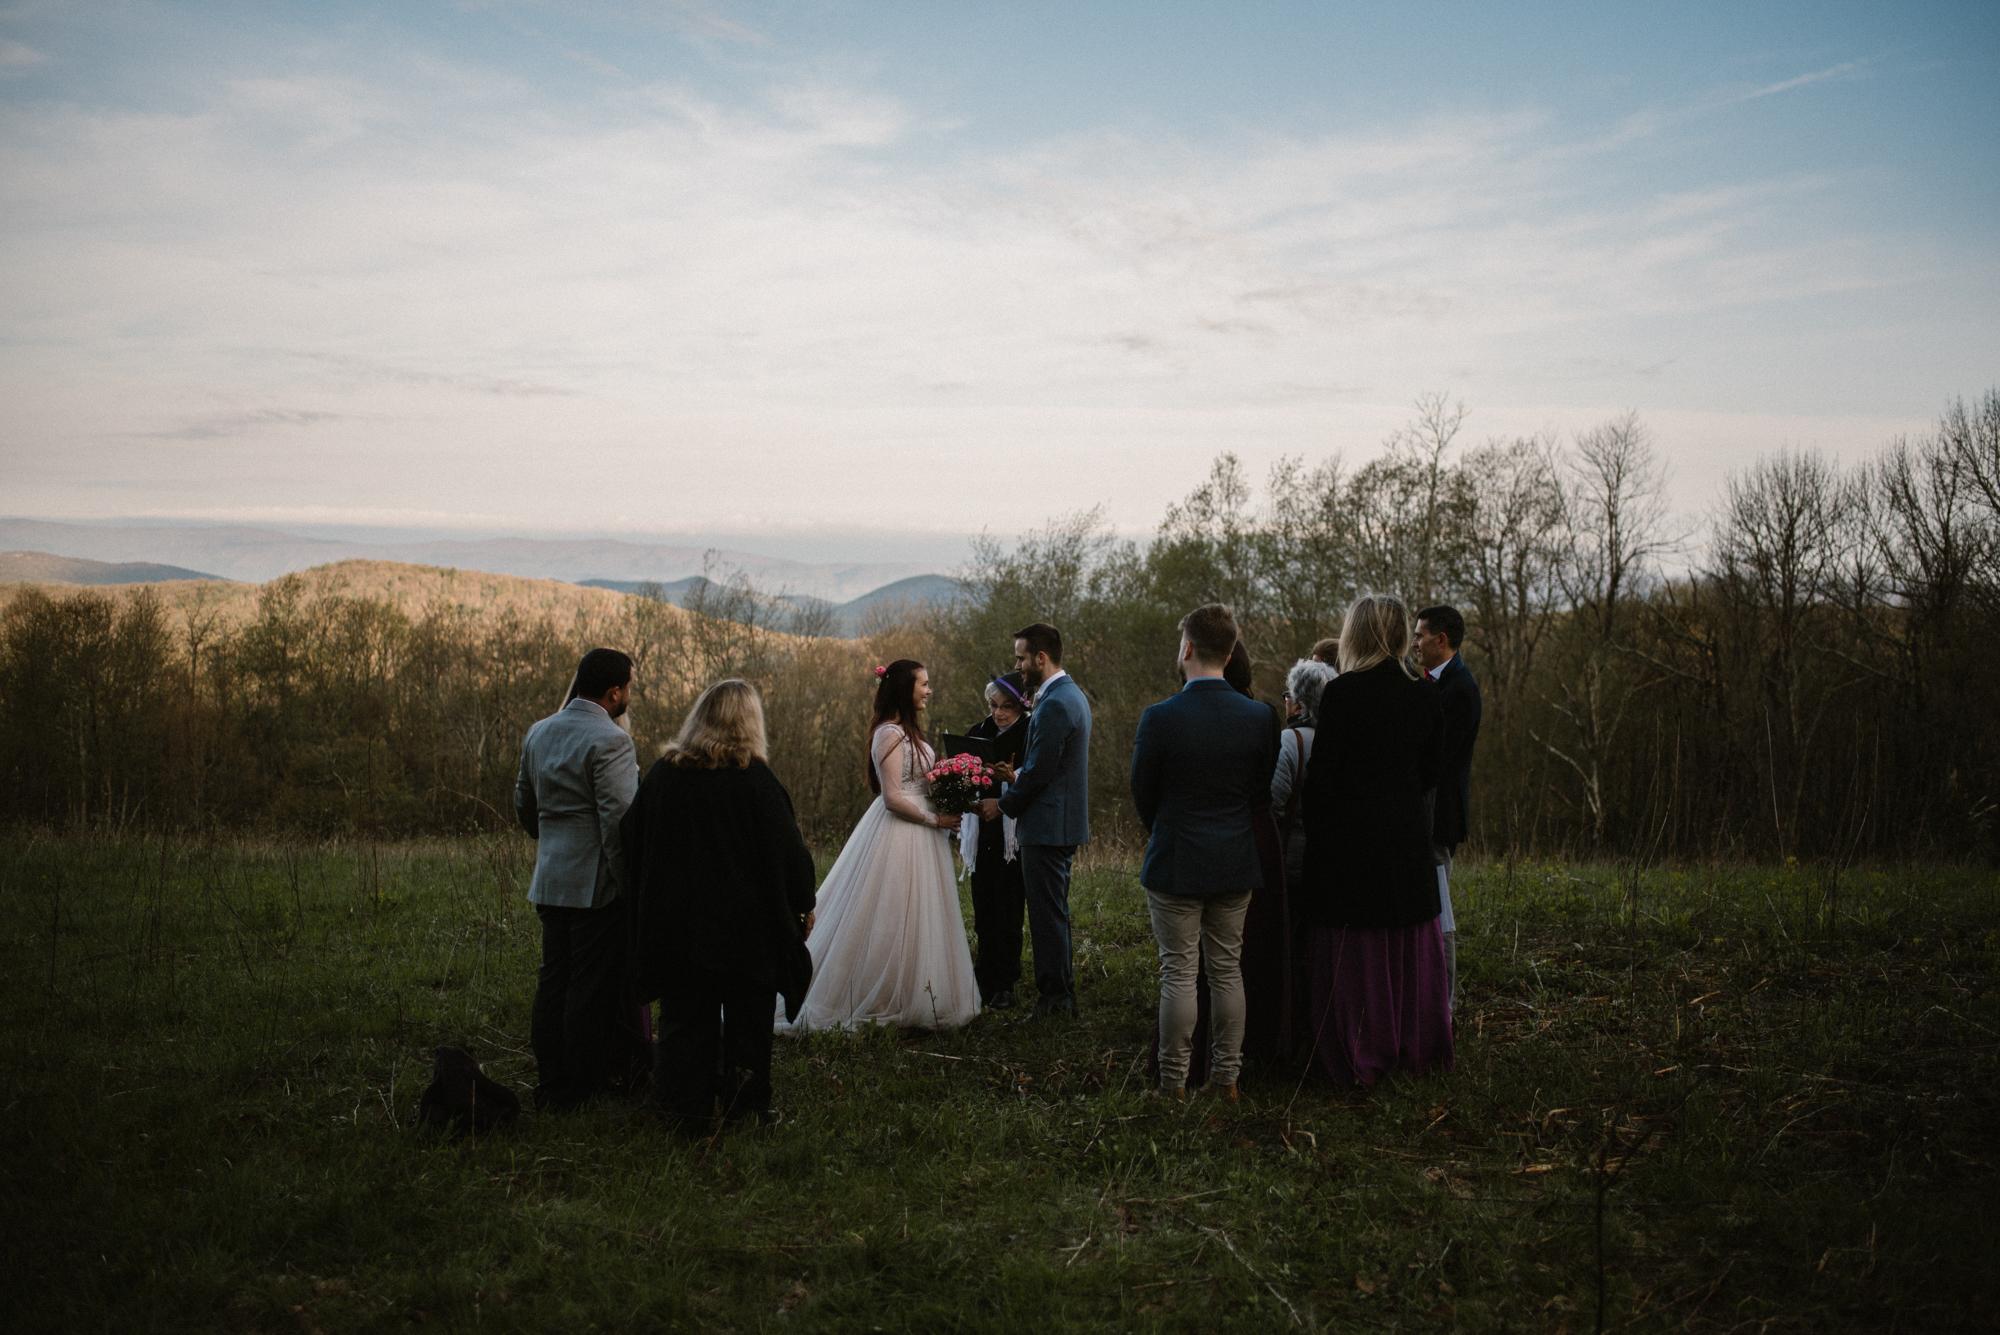 Paula and Andrew - Small Adventurous Wedding in Shenandoah National Park - Blue Ridge Mountain Wedding - White Sails Creative - Mountain Elopement_17.jpg